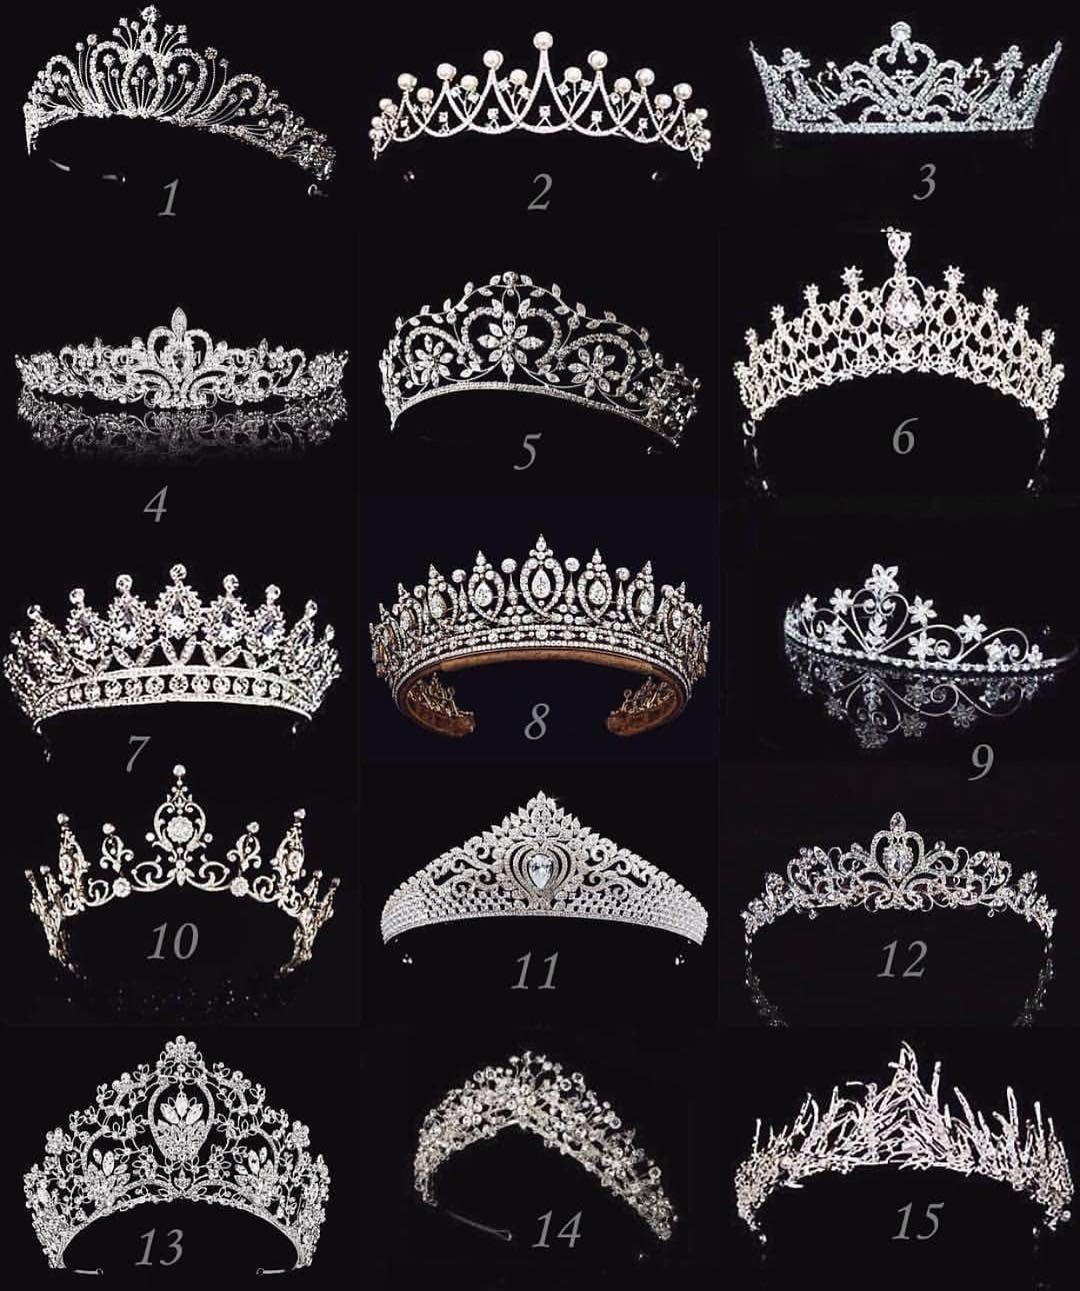 "The Catwalk Latinoamerica on Instagram: ""Elige tu #tiara de 1 a 15 cuál usarías tú?"